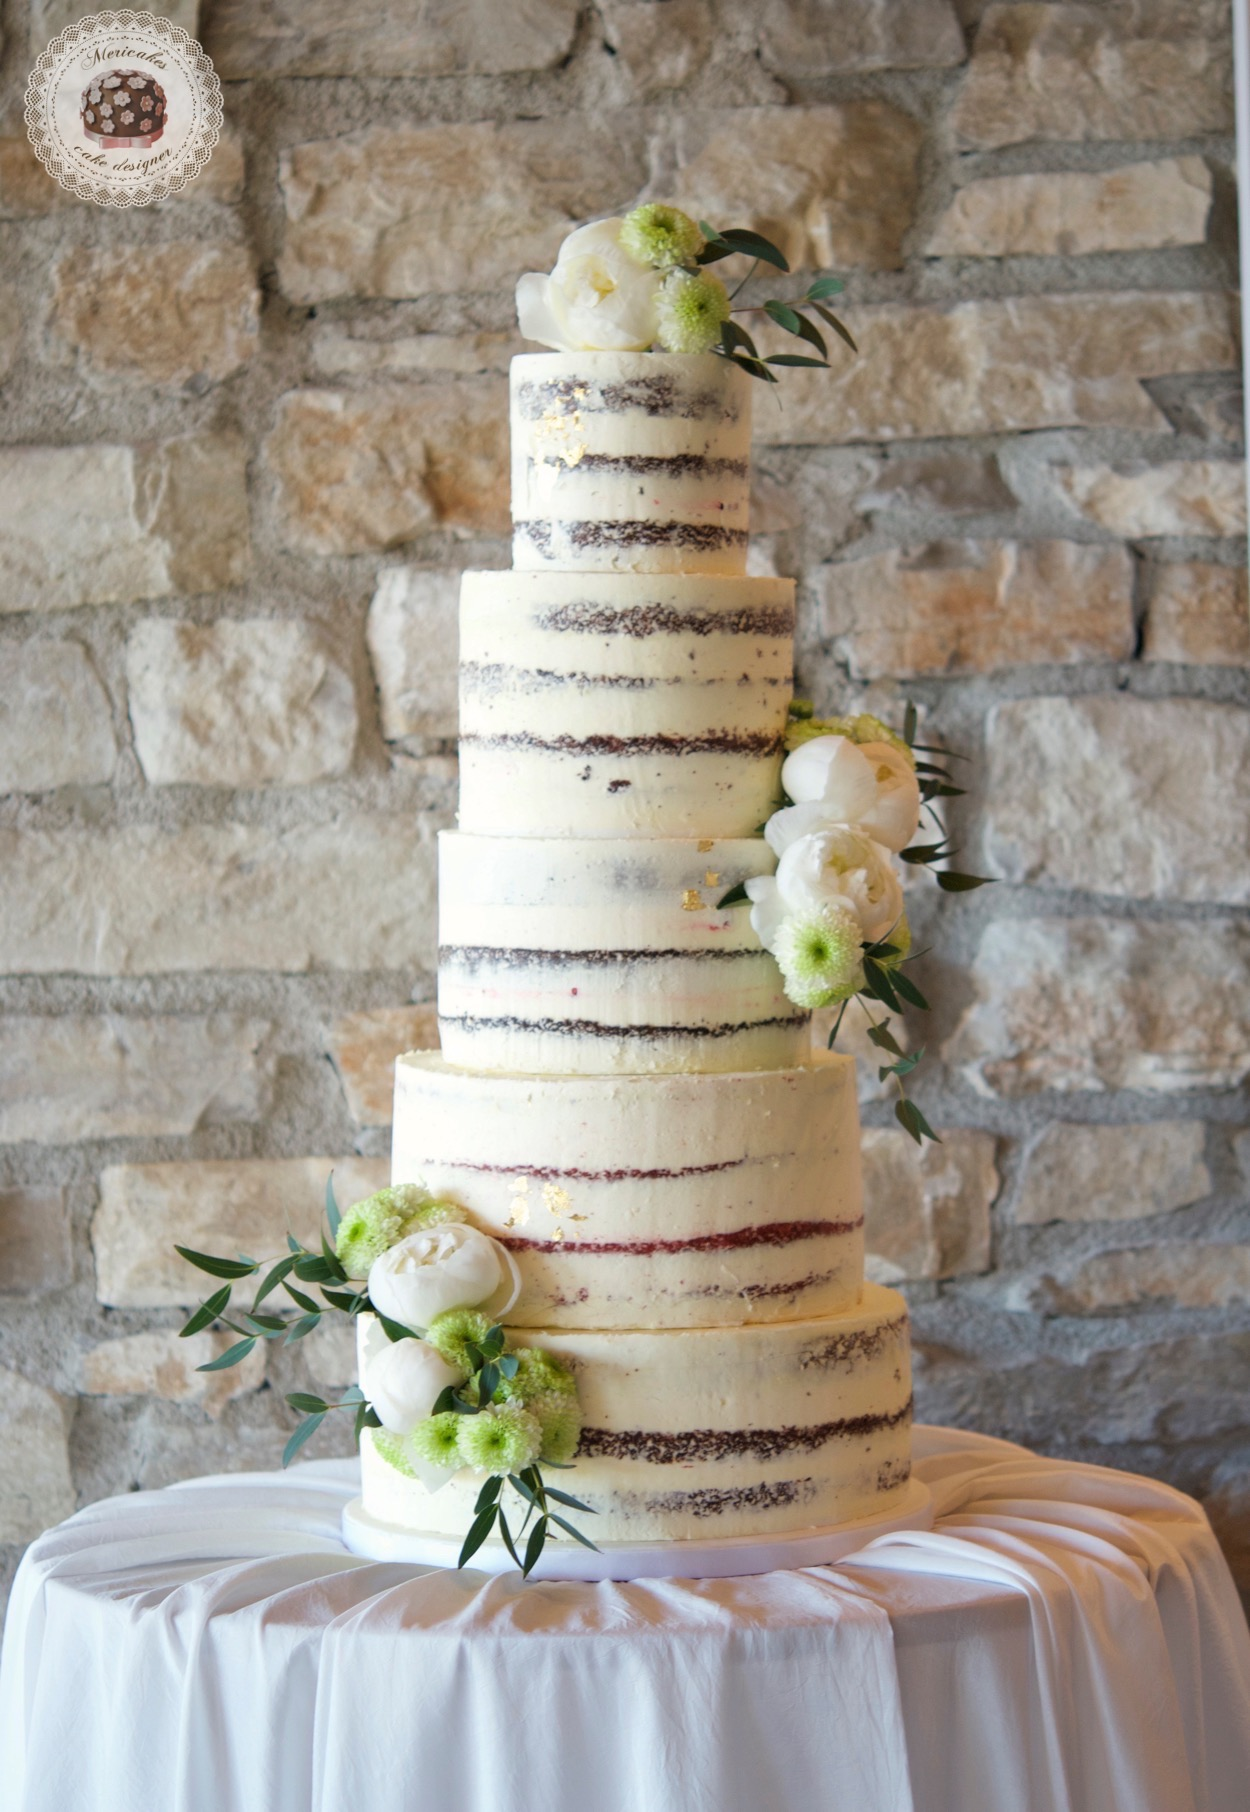 Semi naked cake, red velvet, wedding cake, tarta de boda, spain wedding, wedding flowers, peony, peonias, mericakes, barcelona wedding, mas de sant llei, gold leaf, eucalyptus, bodas reales, casarse a catalunya